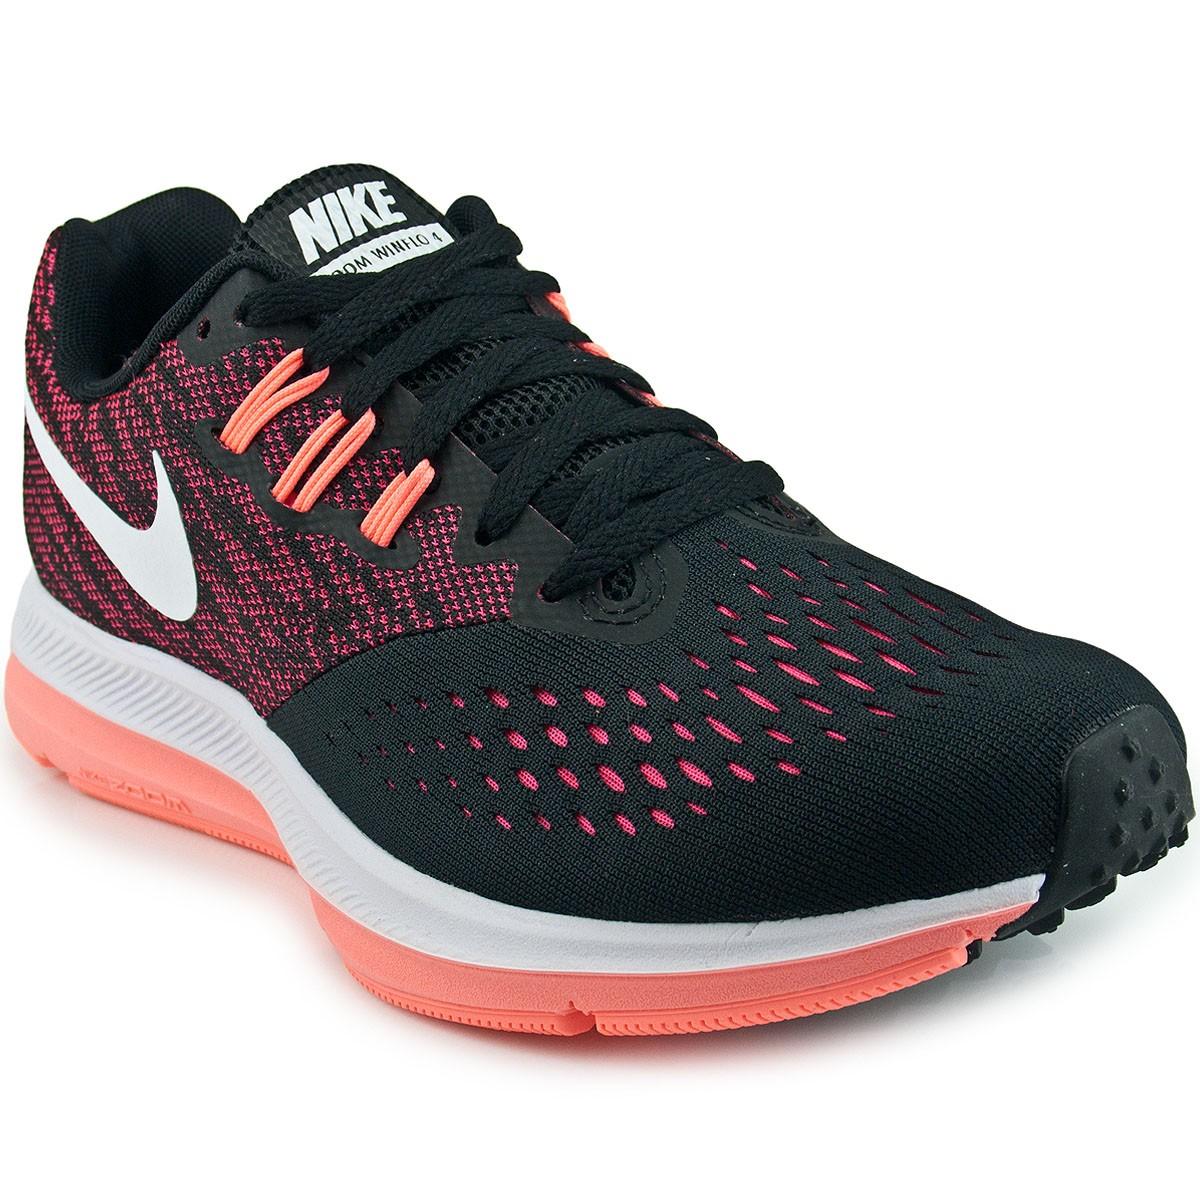 9de03e75171 Tênis Nike Zoom Winflo 4 W 898485